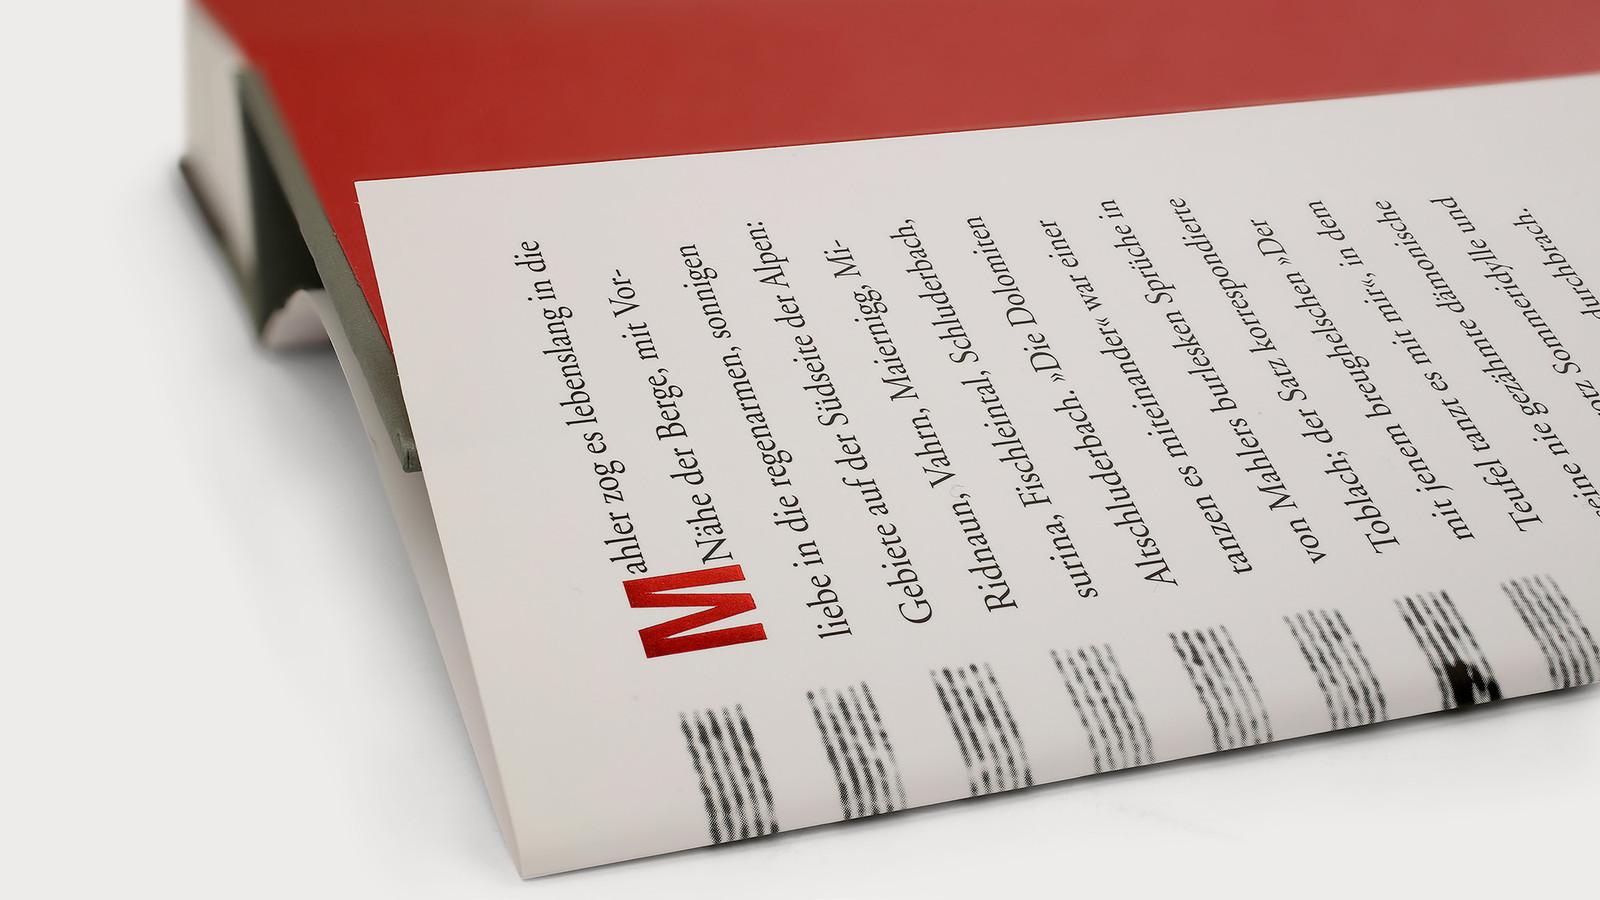 Book - Publishing house Athesia